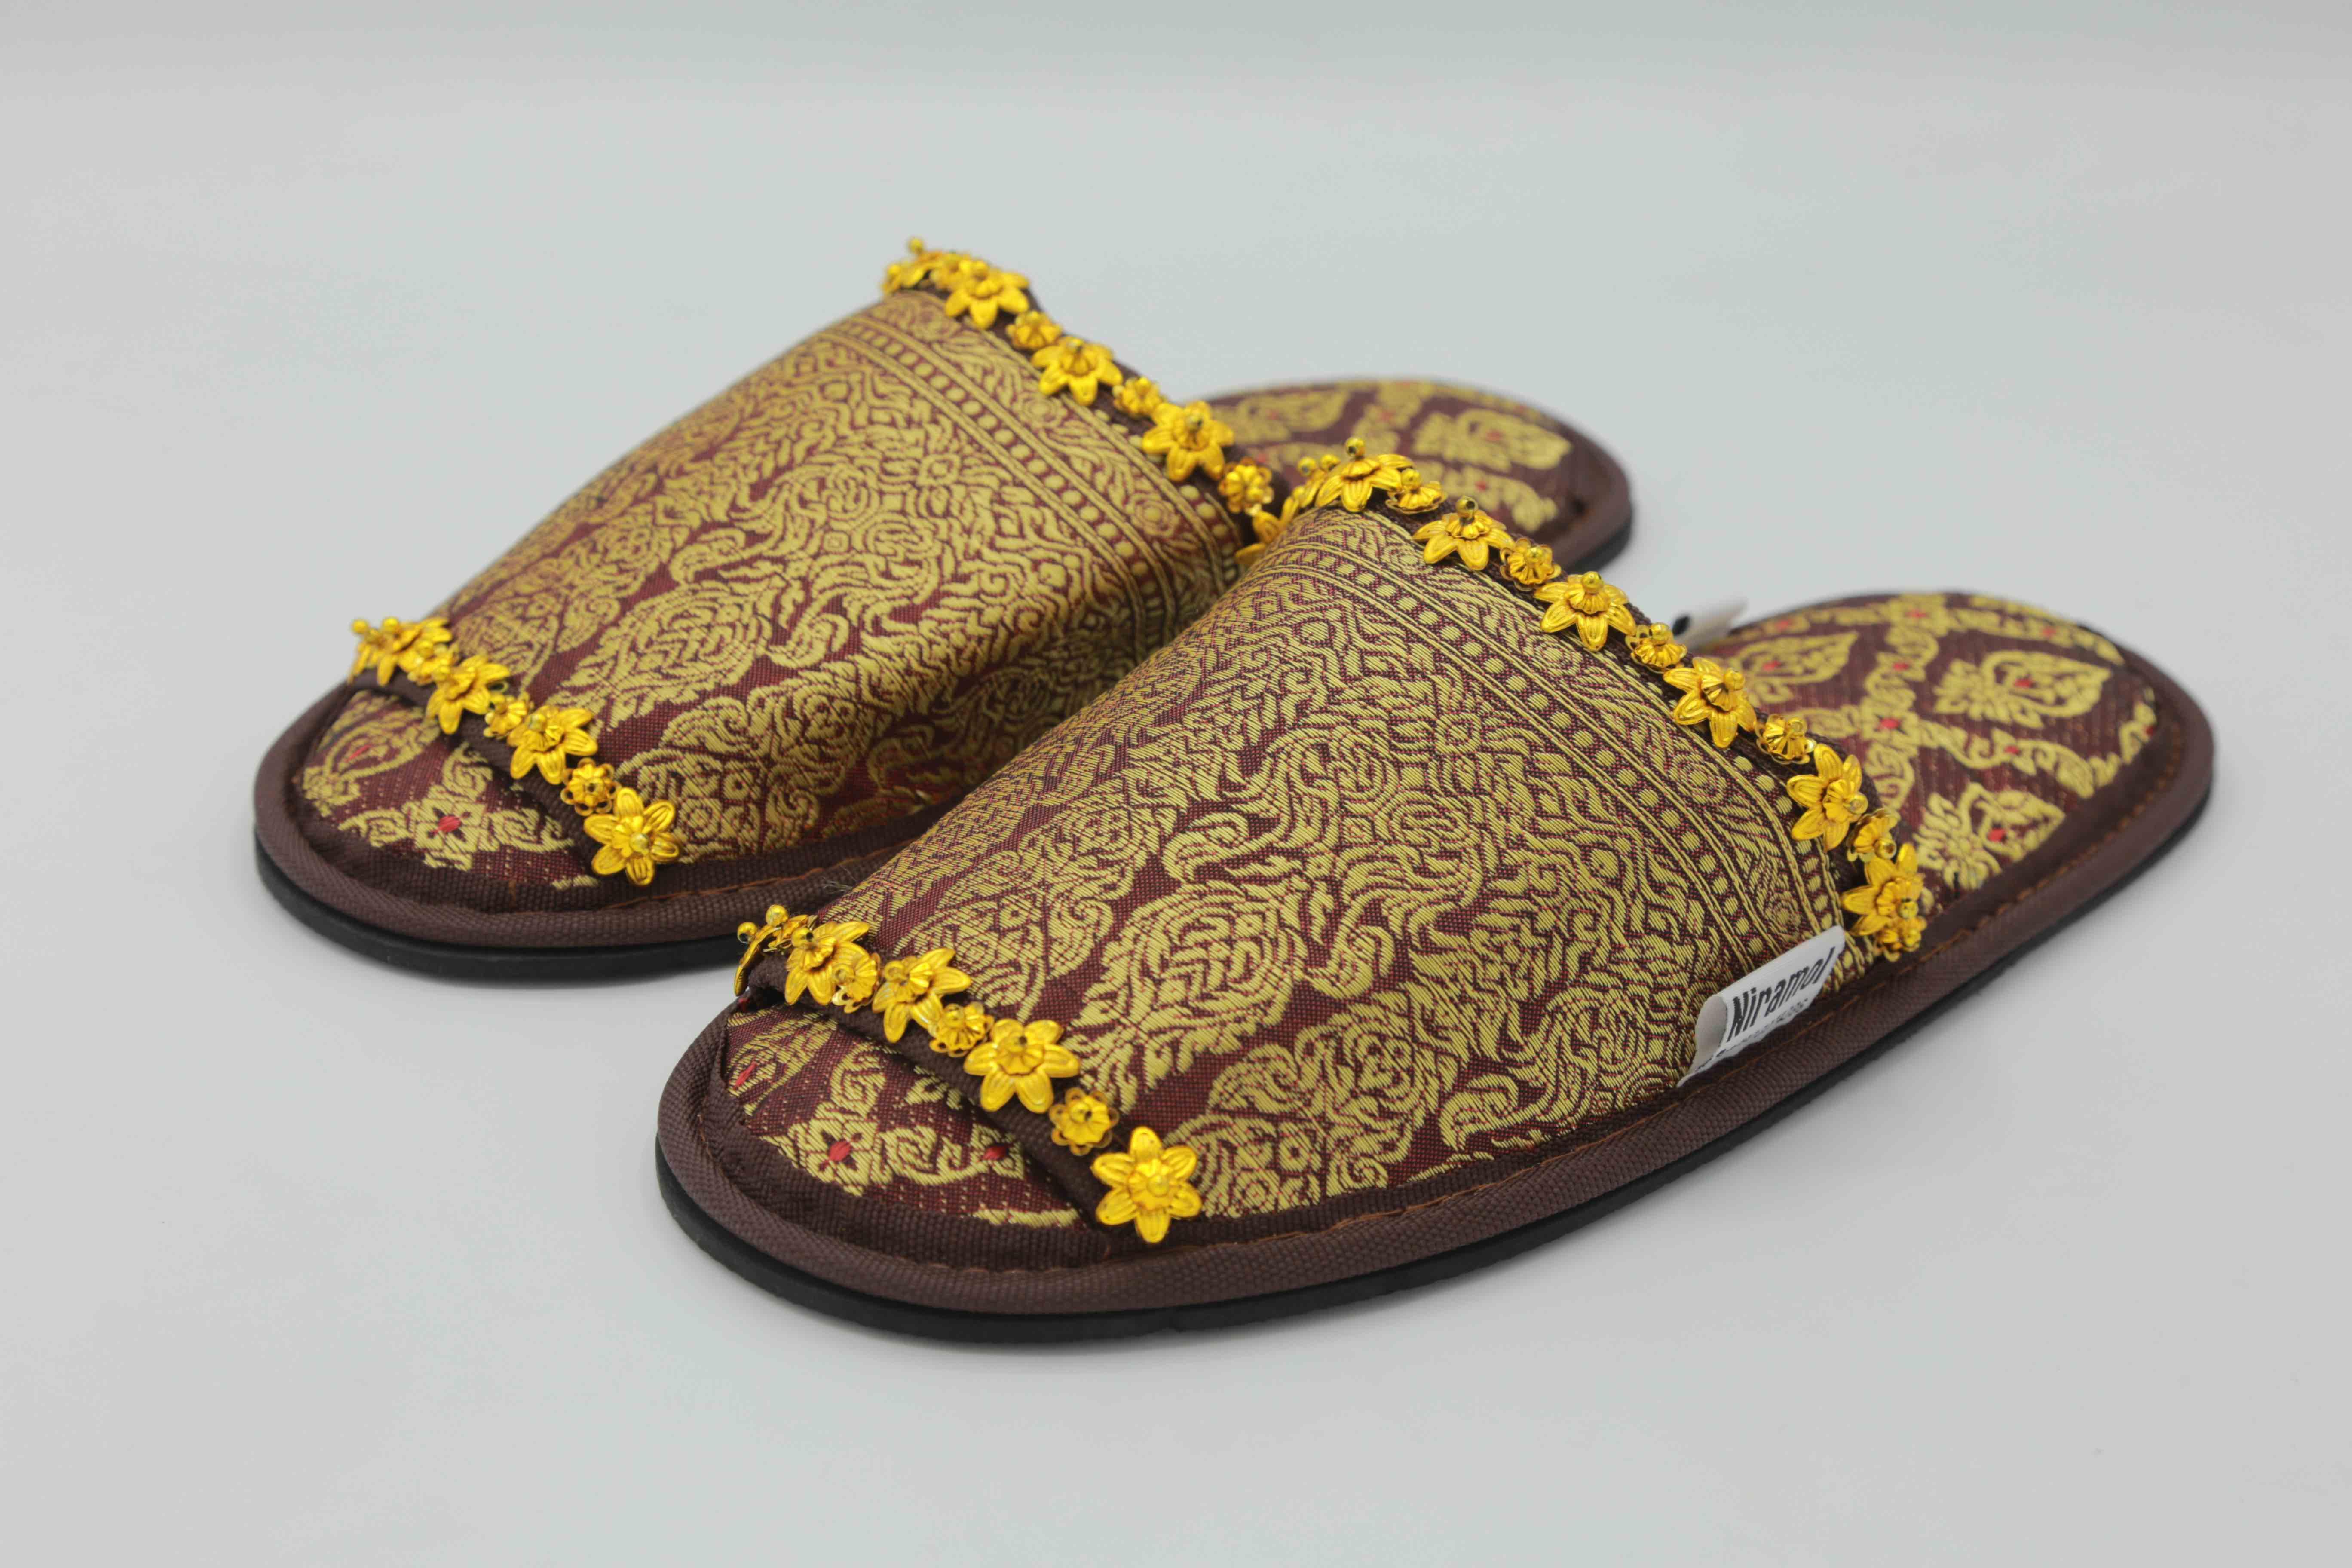 C03037 รองเท้าผ้าไทย นิระมล